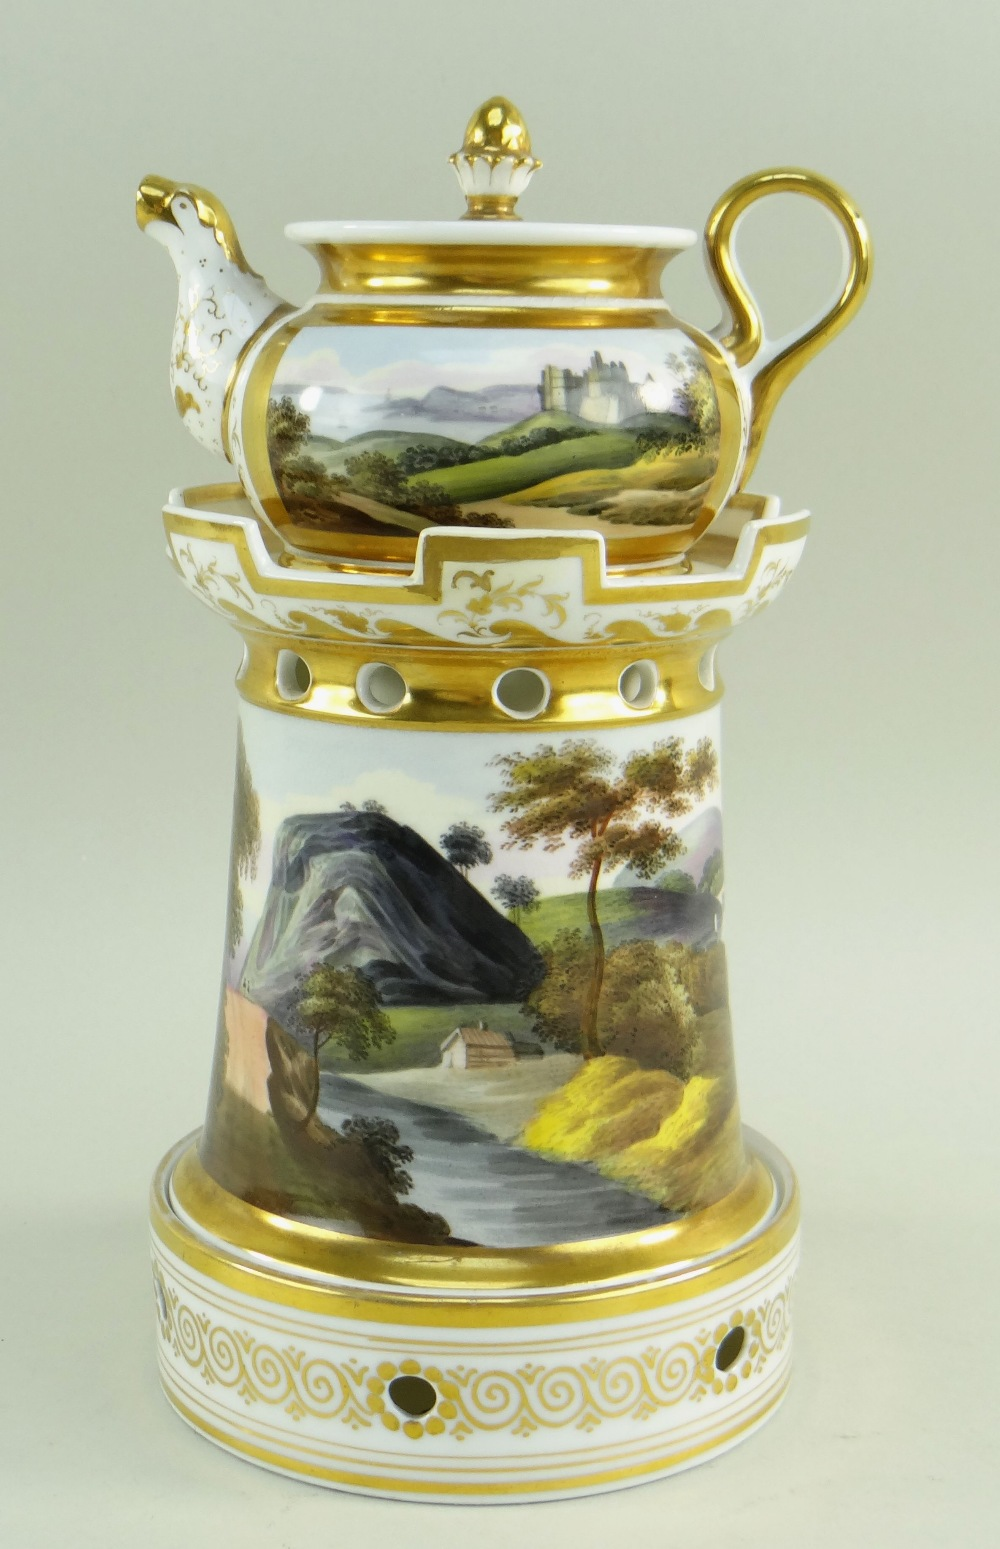 A WELSH LANDSCAPE ENGLISH PORCELAIN VEILLEUSE (tea-pot and warming stand) comprising miniature - Image 3 of 5